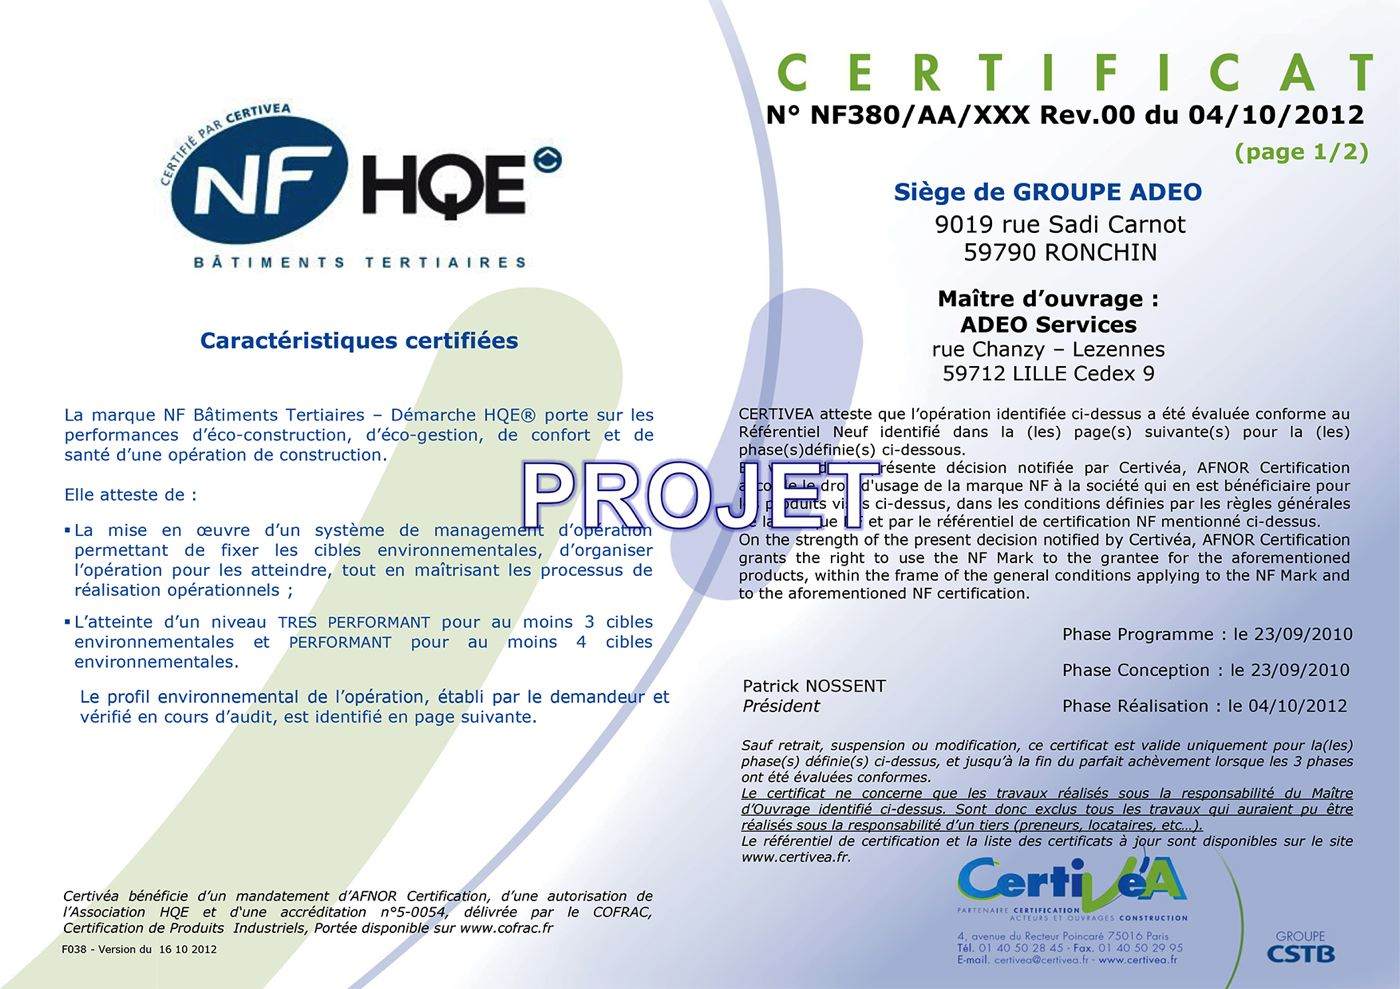 adeo_Certificat dÇf_phase R-1.jpg